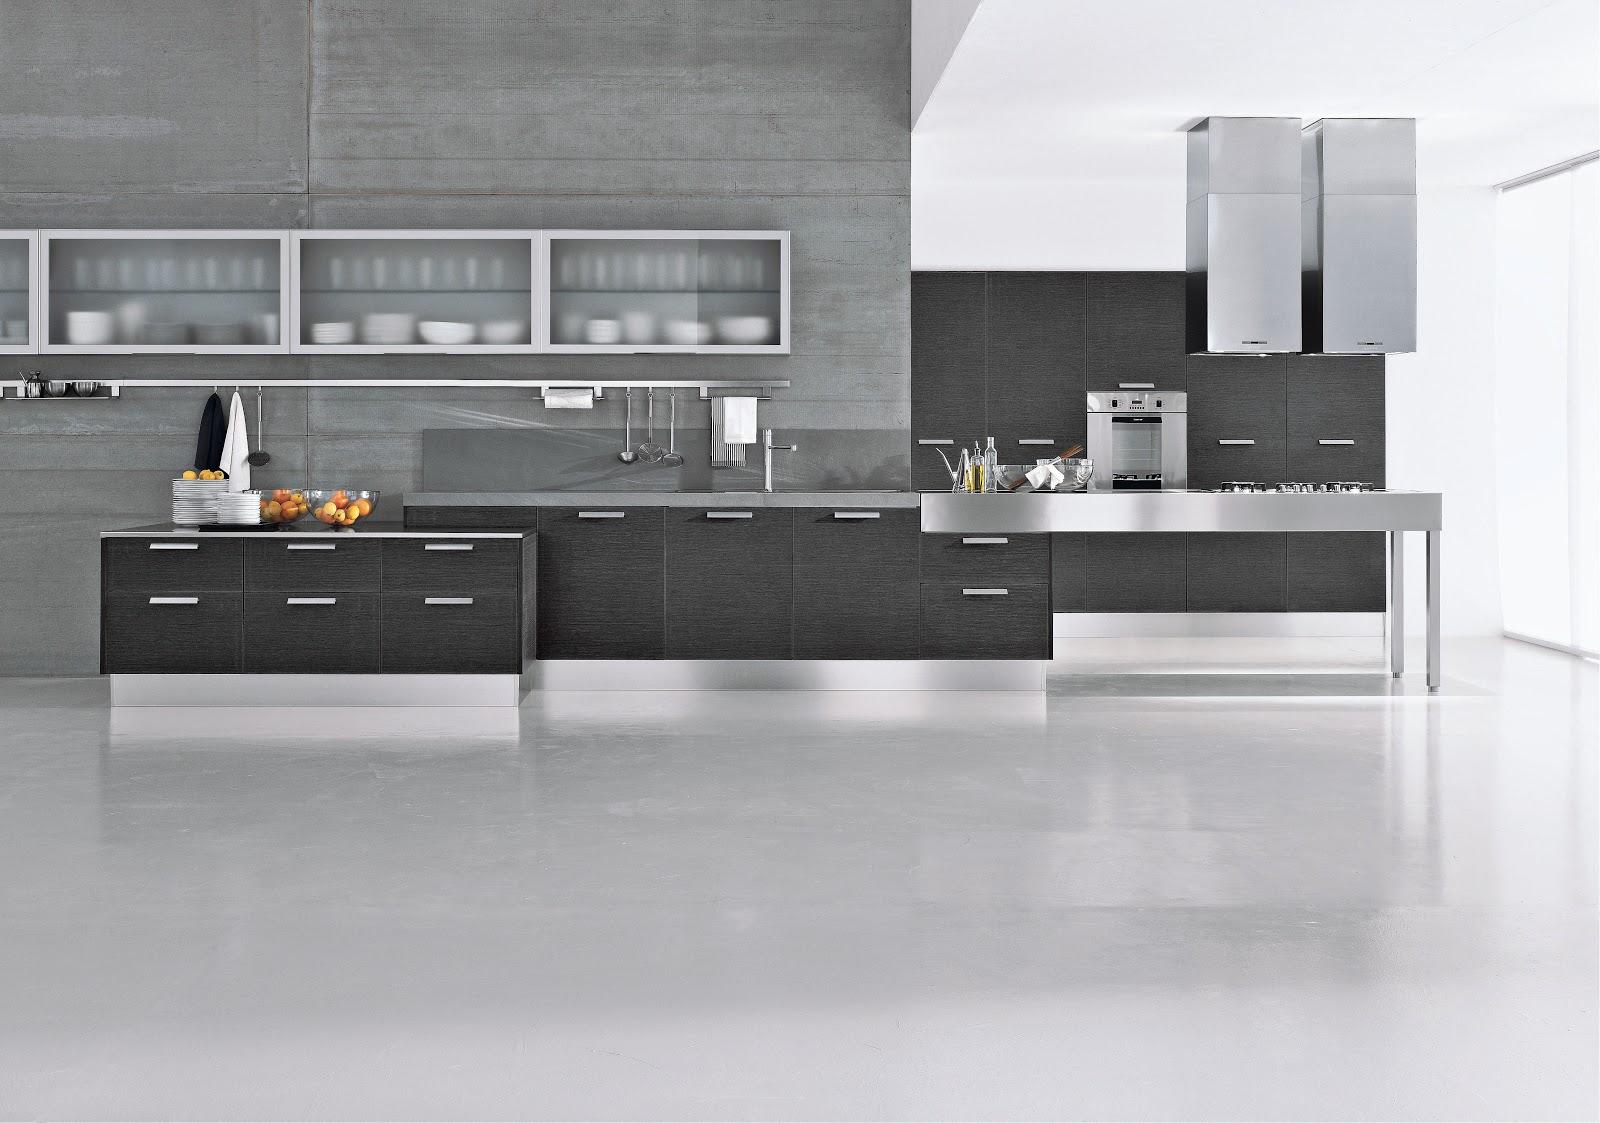 Charlotte Kitchen Cabinets Composting Waste My Modern Eco Friendly Italian Style Berloni Kitchens Nc E3